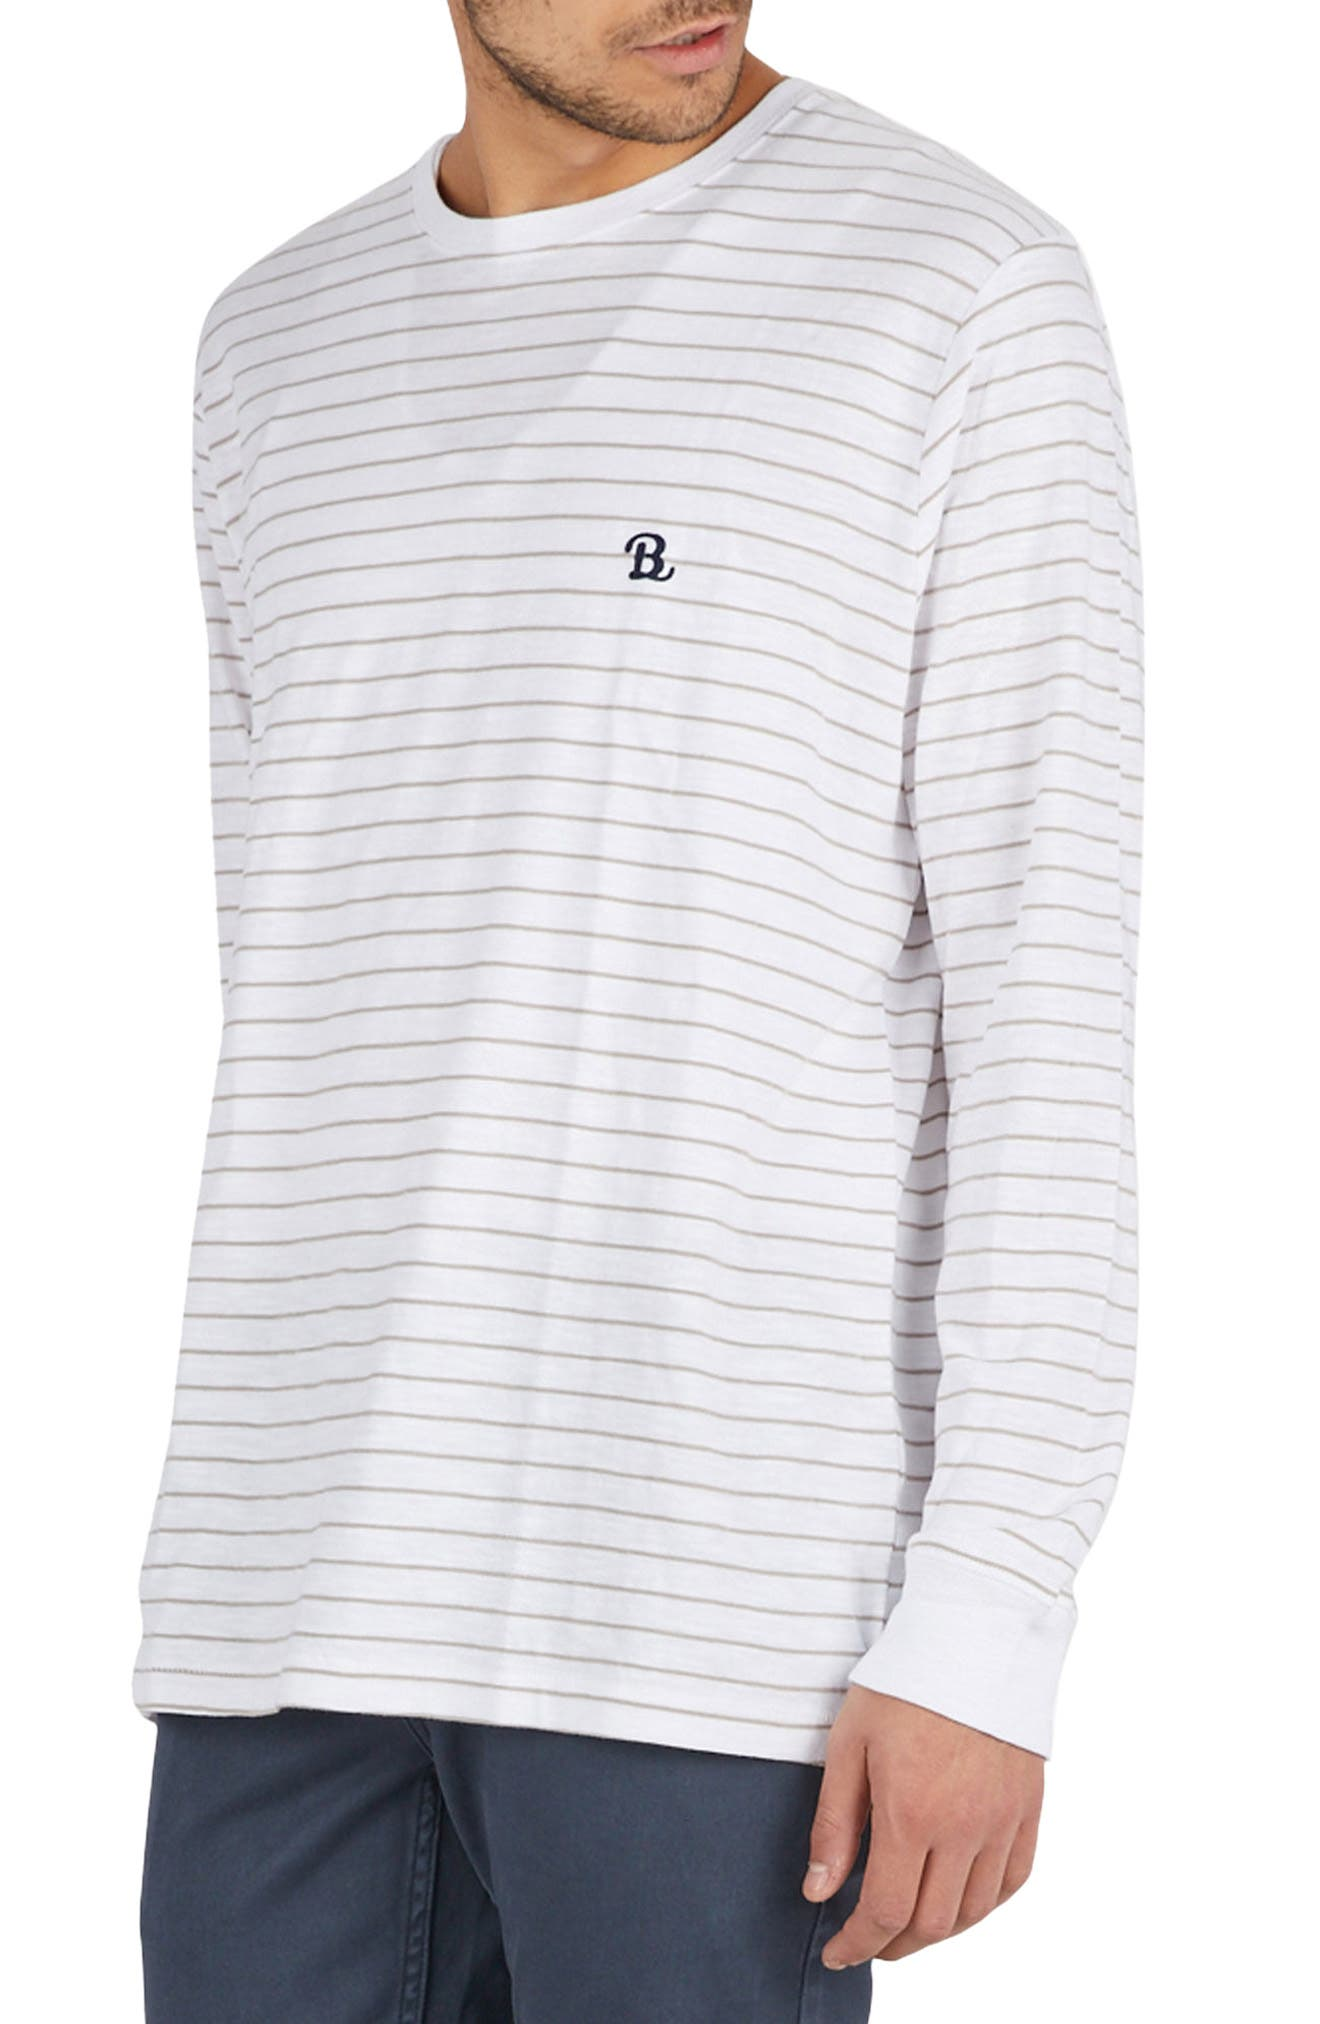 B. Schooled T-Shirt,                             Alternate thumbnail 3, color,                             Beige Stripe